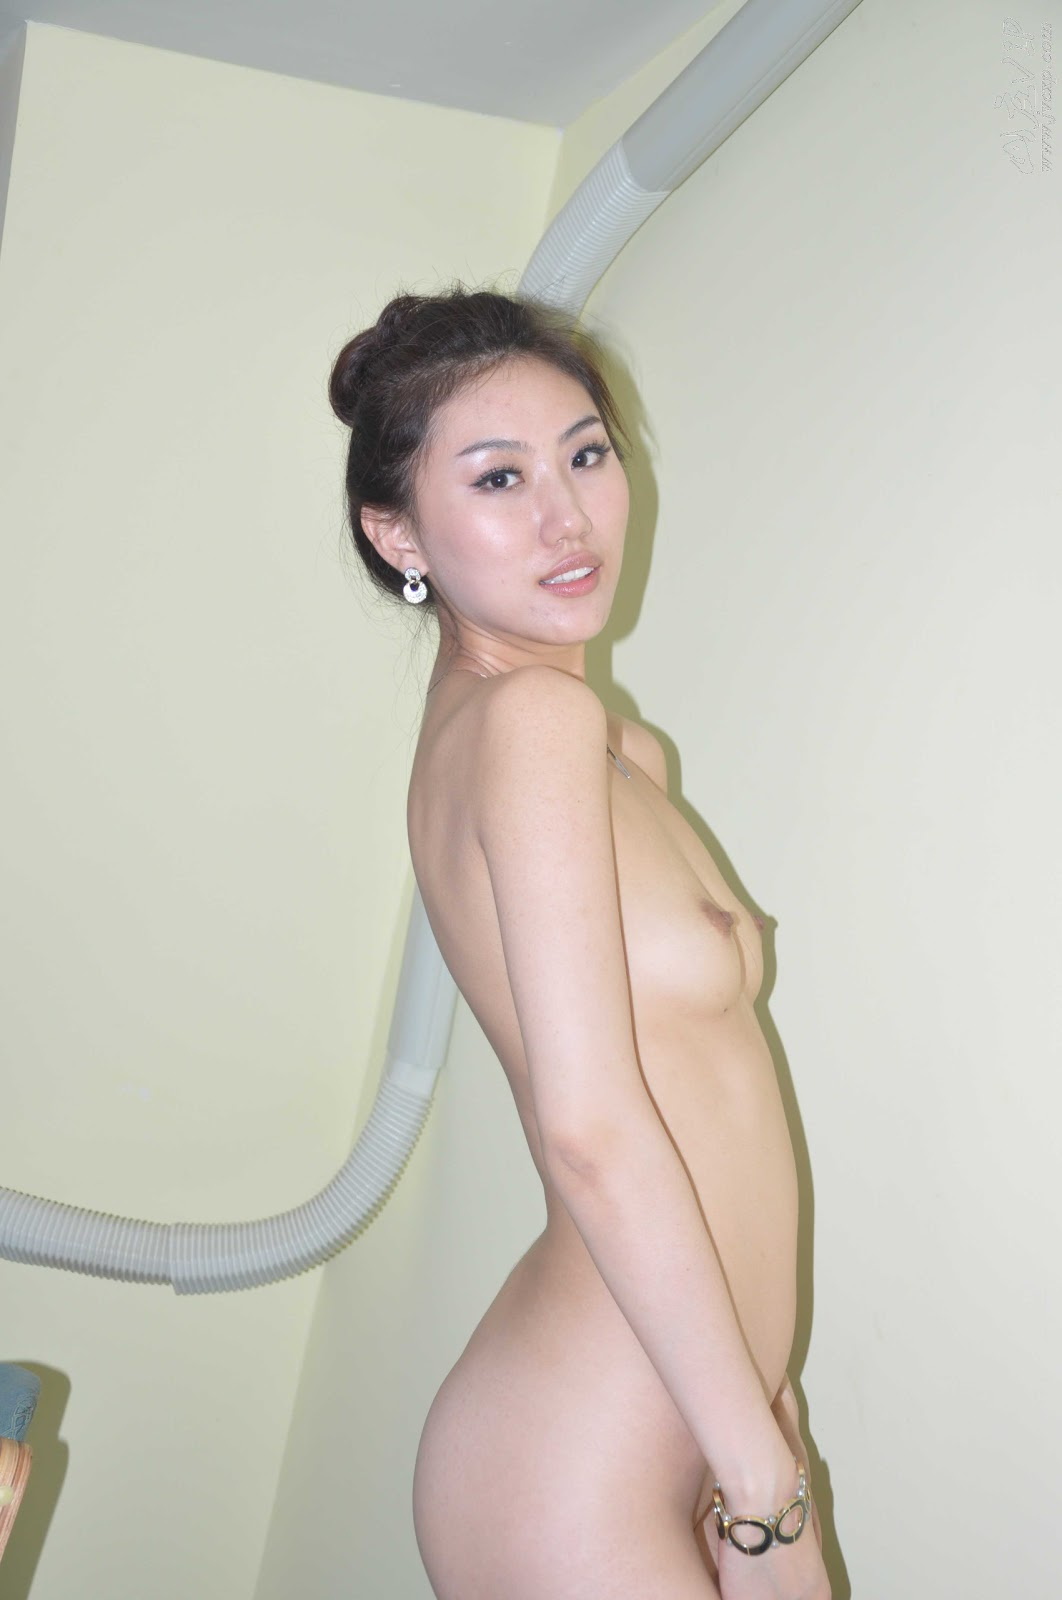 http://2.bp.blogspot.com/_flCG3ABq_jQ/TVJciUBEtuI/AAAAAAAAABg/jZj4KaAWfjY/s1600/World+Supermodel+Contest+China+Winner+Leaked+Nude+Photos+www.GutterUncensoredPlus.com+274.jpg